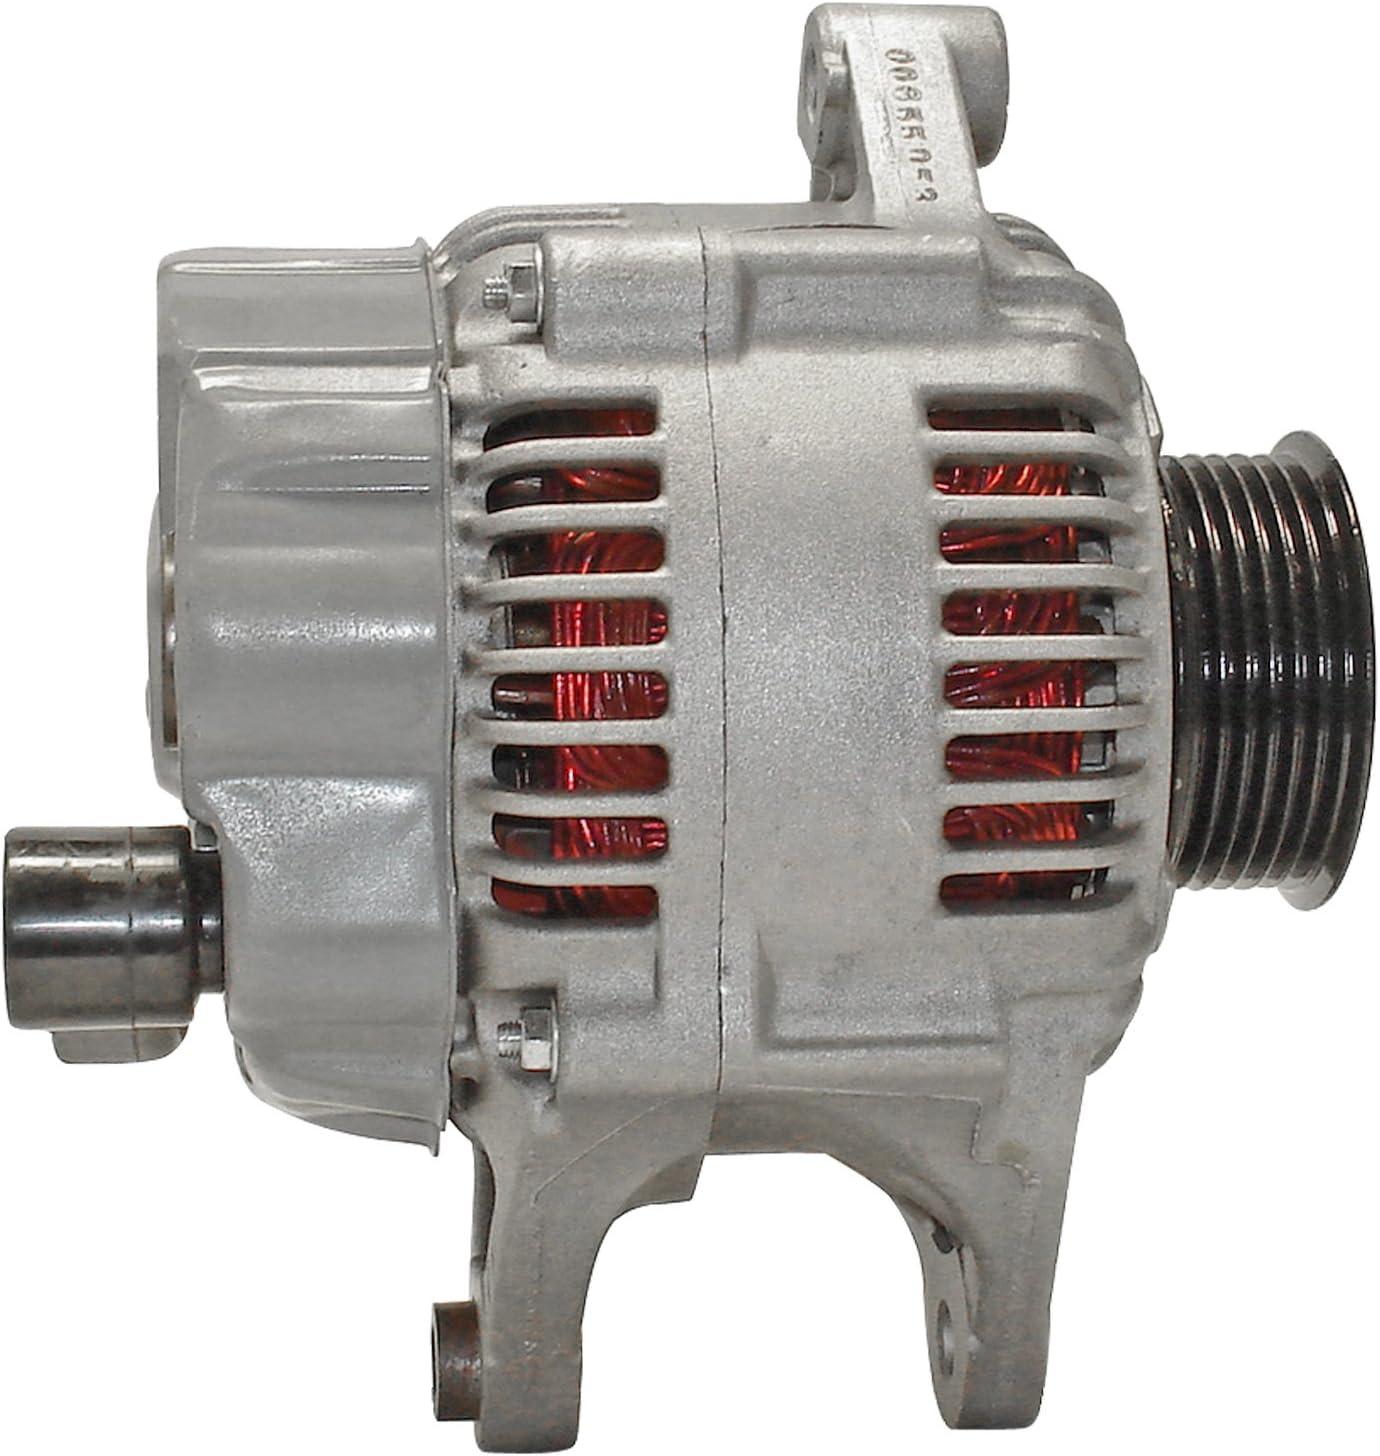 ACDelco 334-1316 Professional Alternator Remanufactured